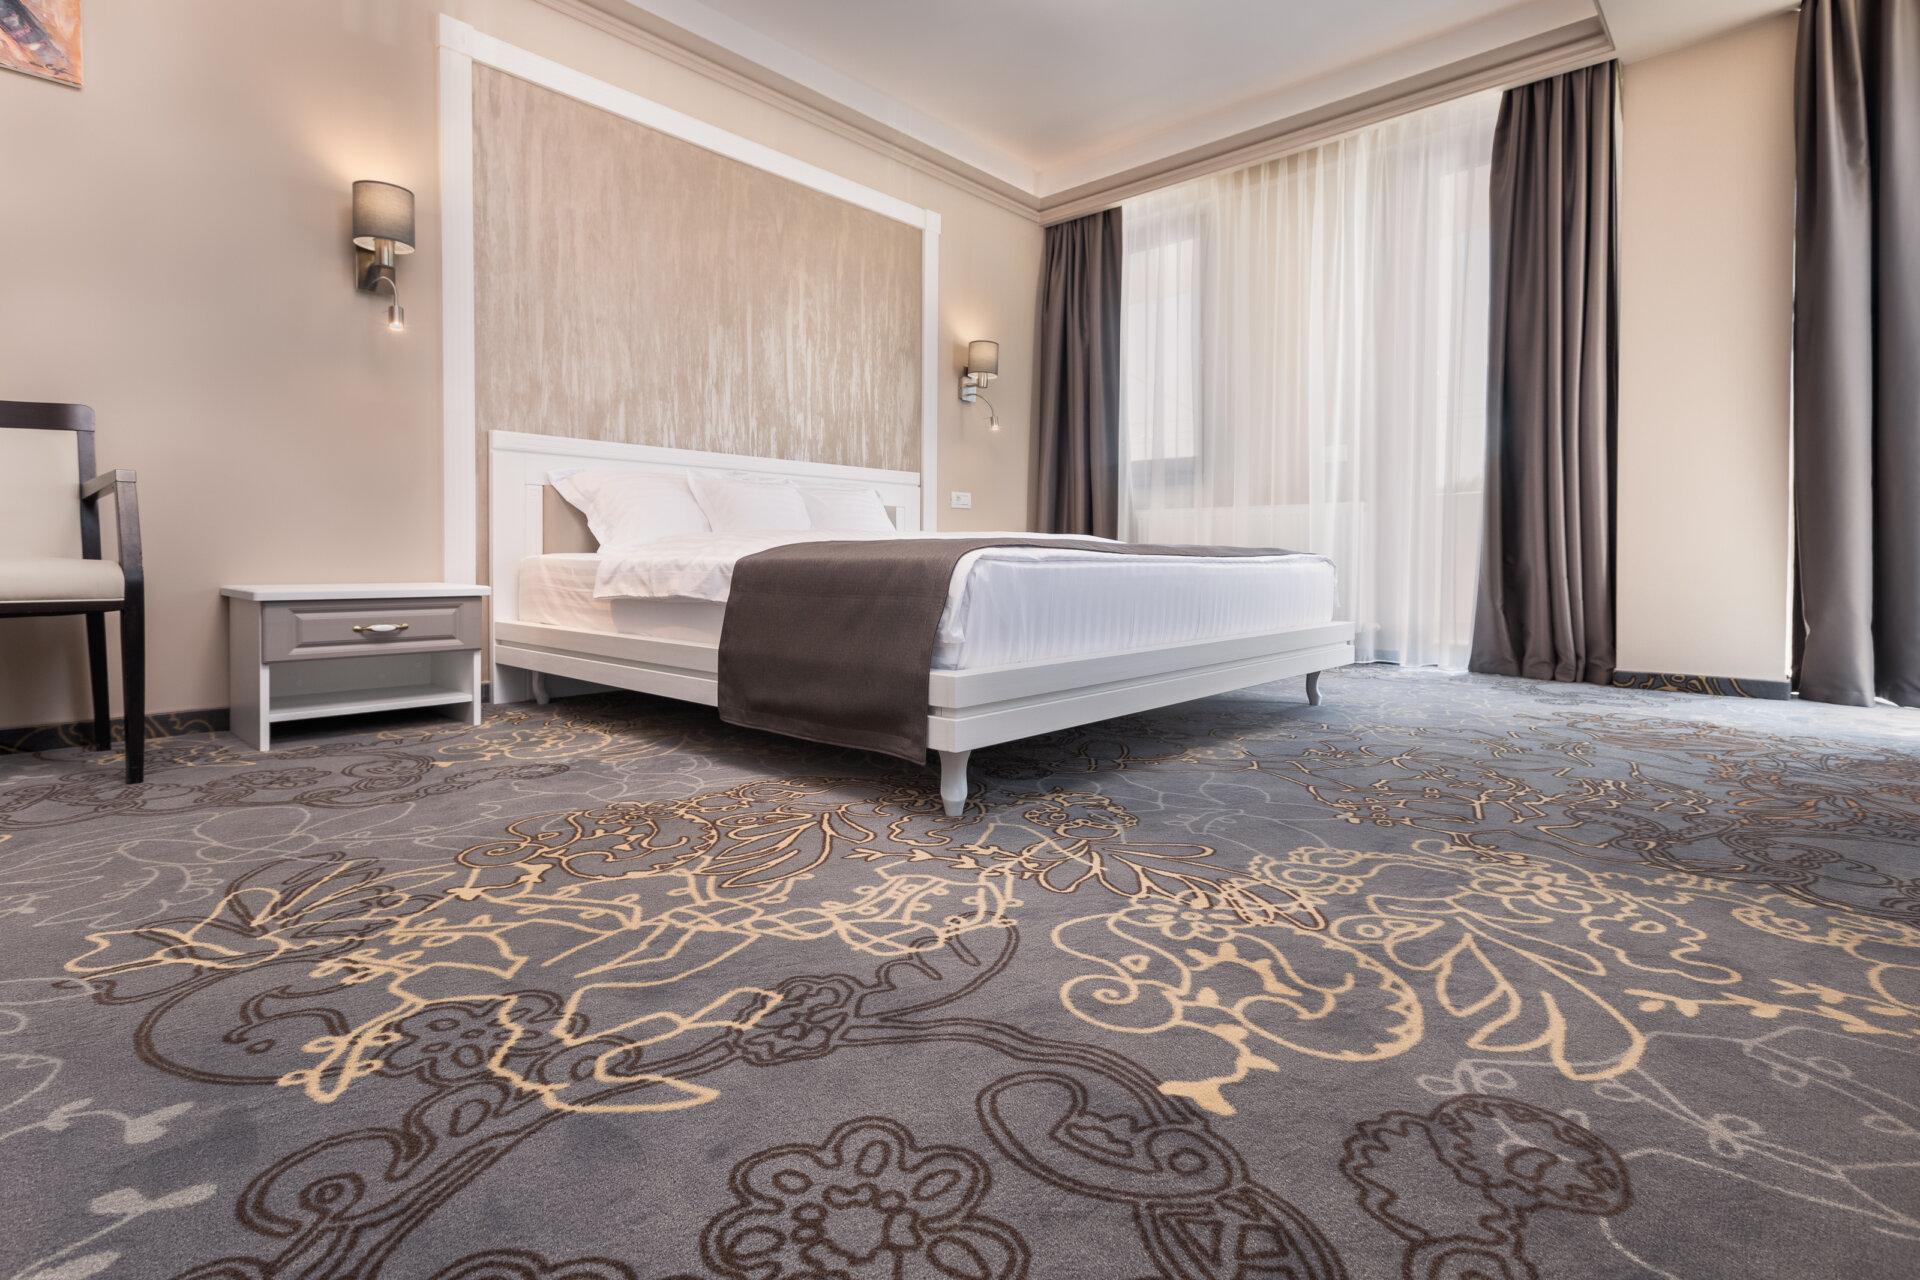 _PRINCIPALA_20210524-carpet&more-mamaia-hotel-scapino-junior-by-hugmedia-002